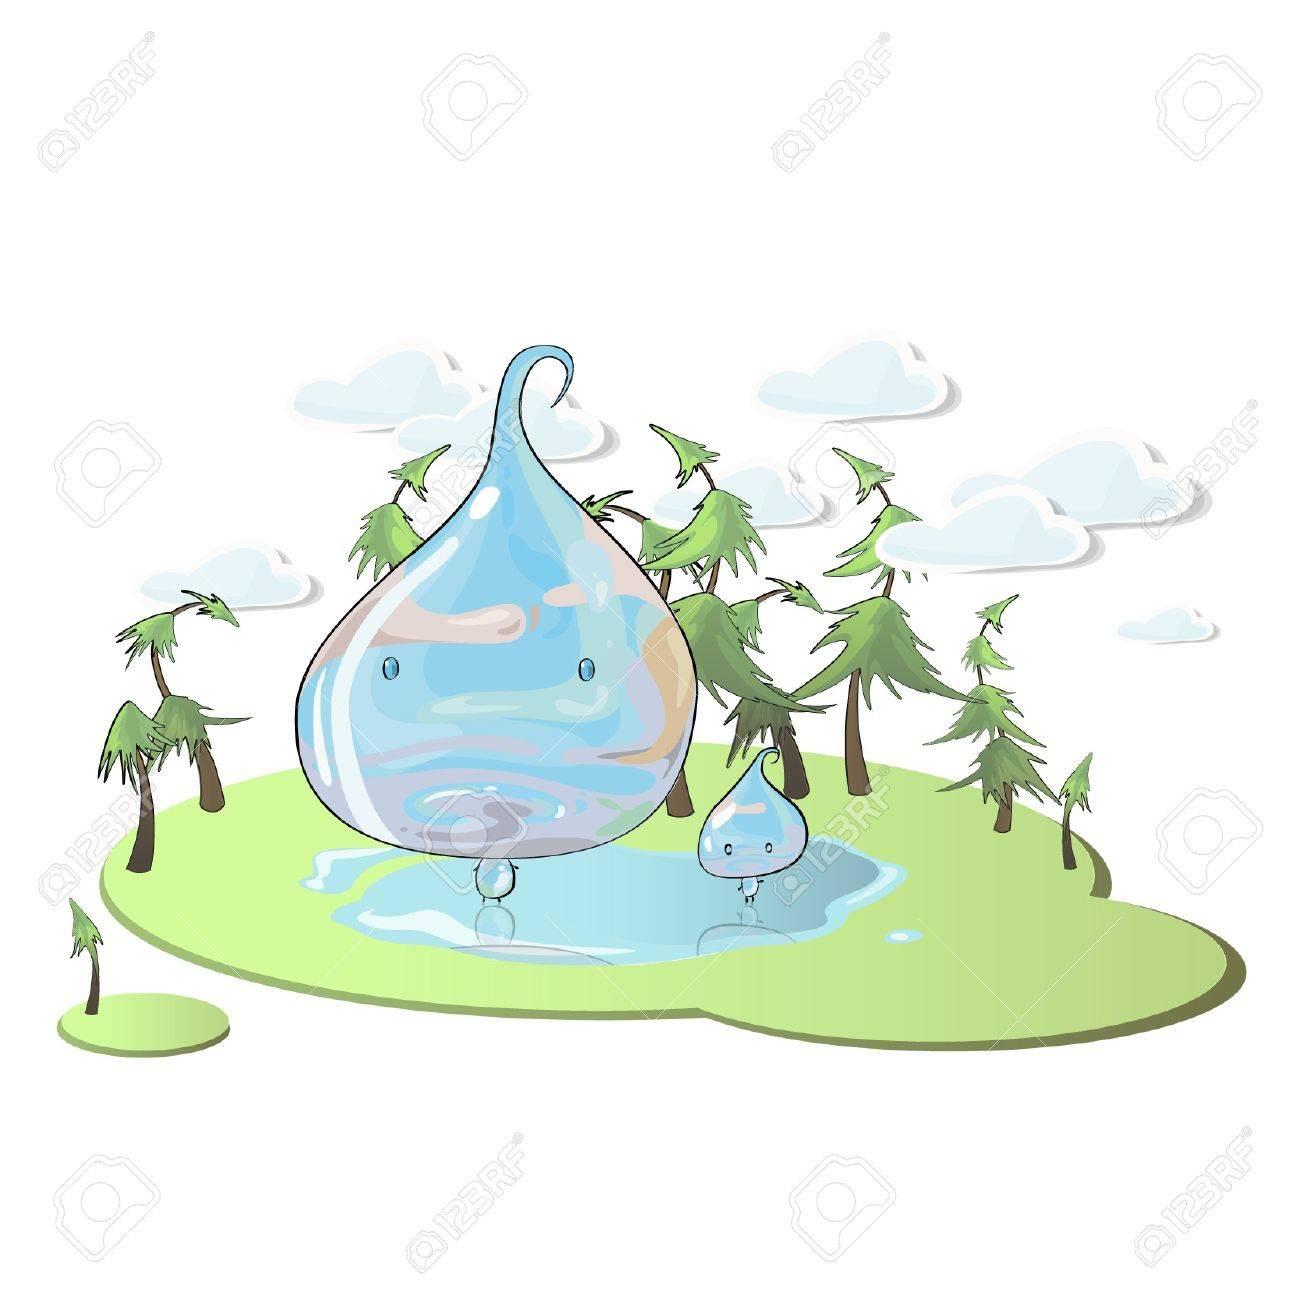 Drop of water in beautiful landscape. Stock Vector - 16851517